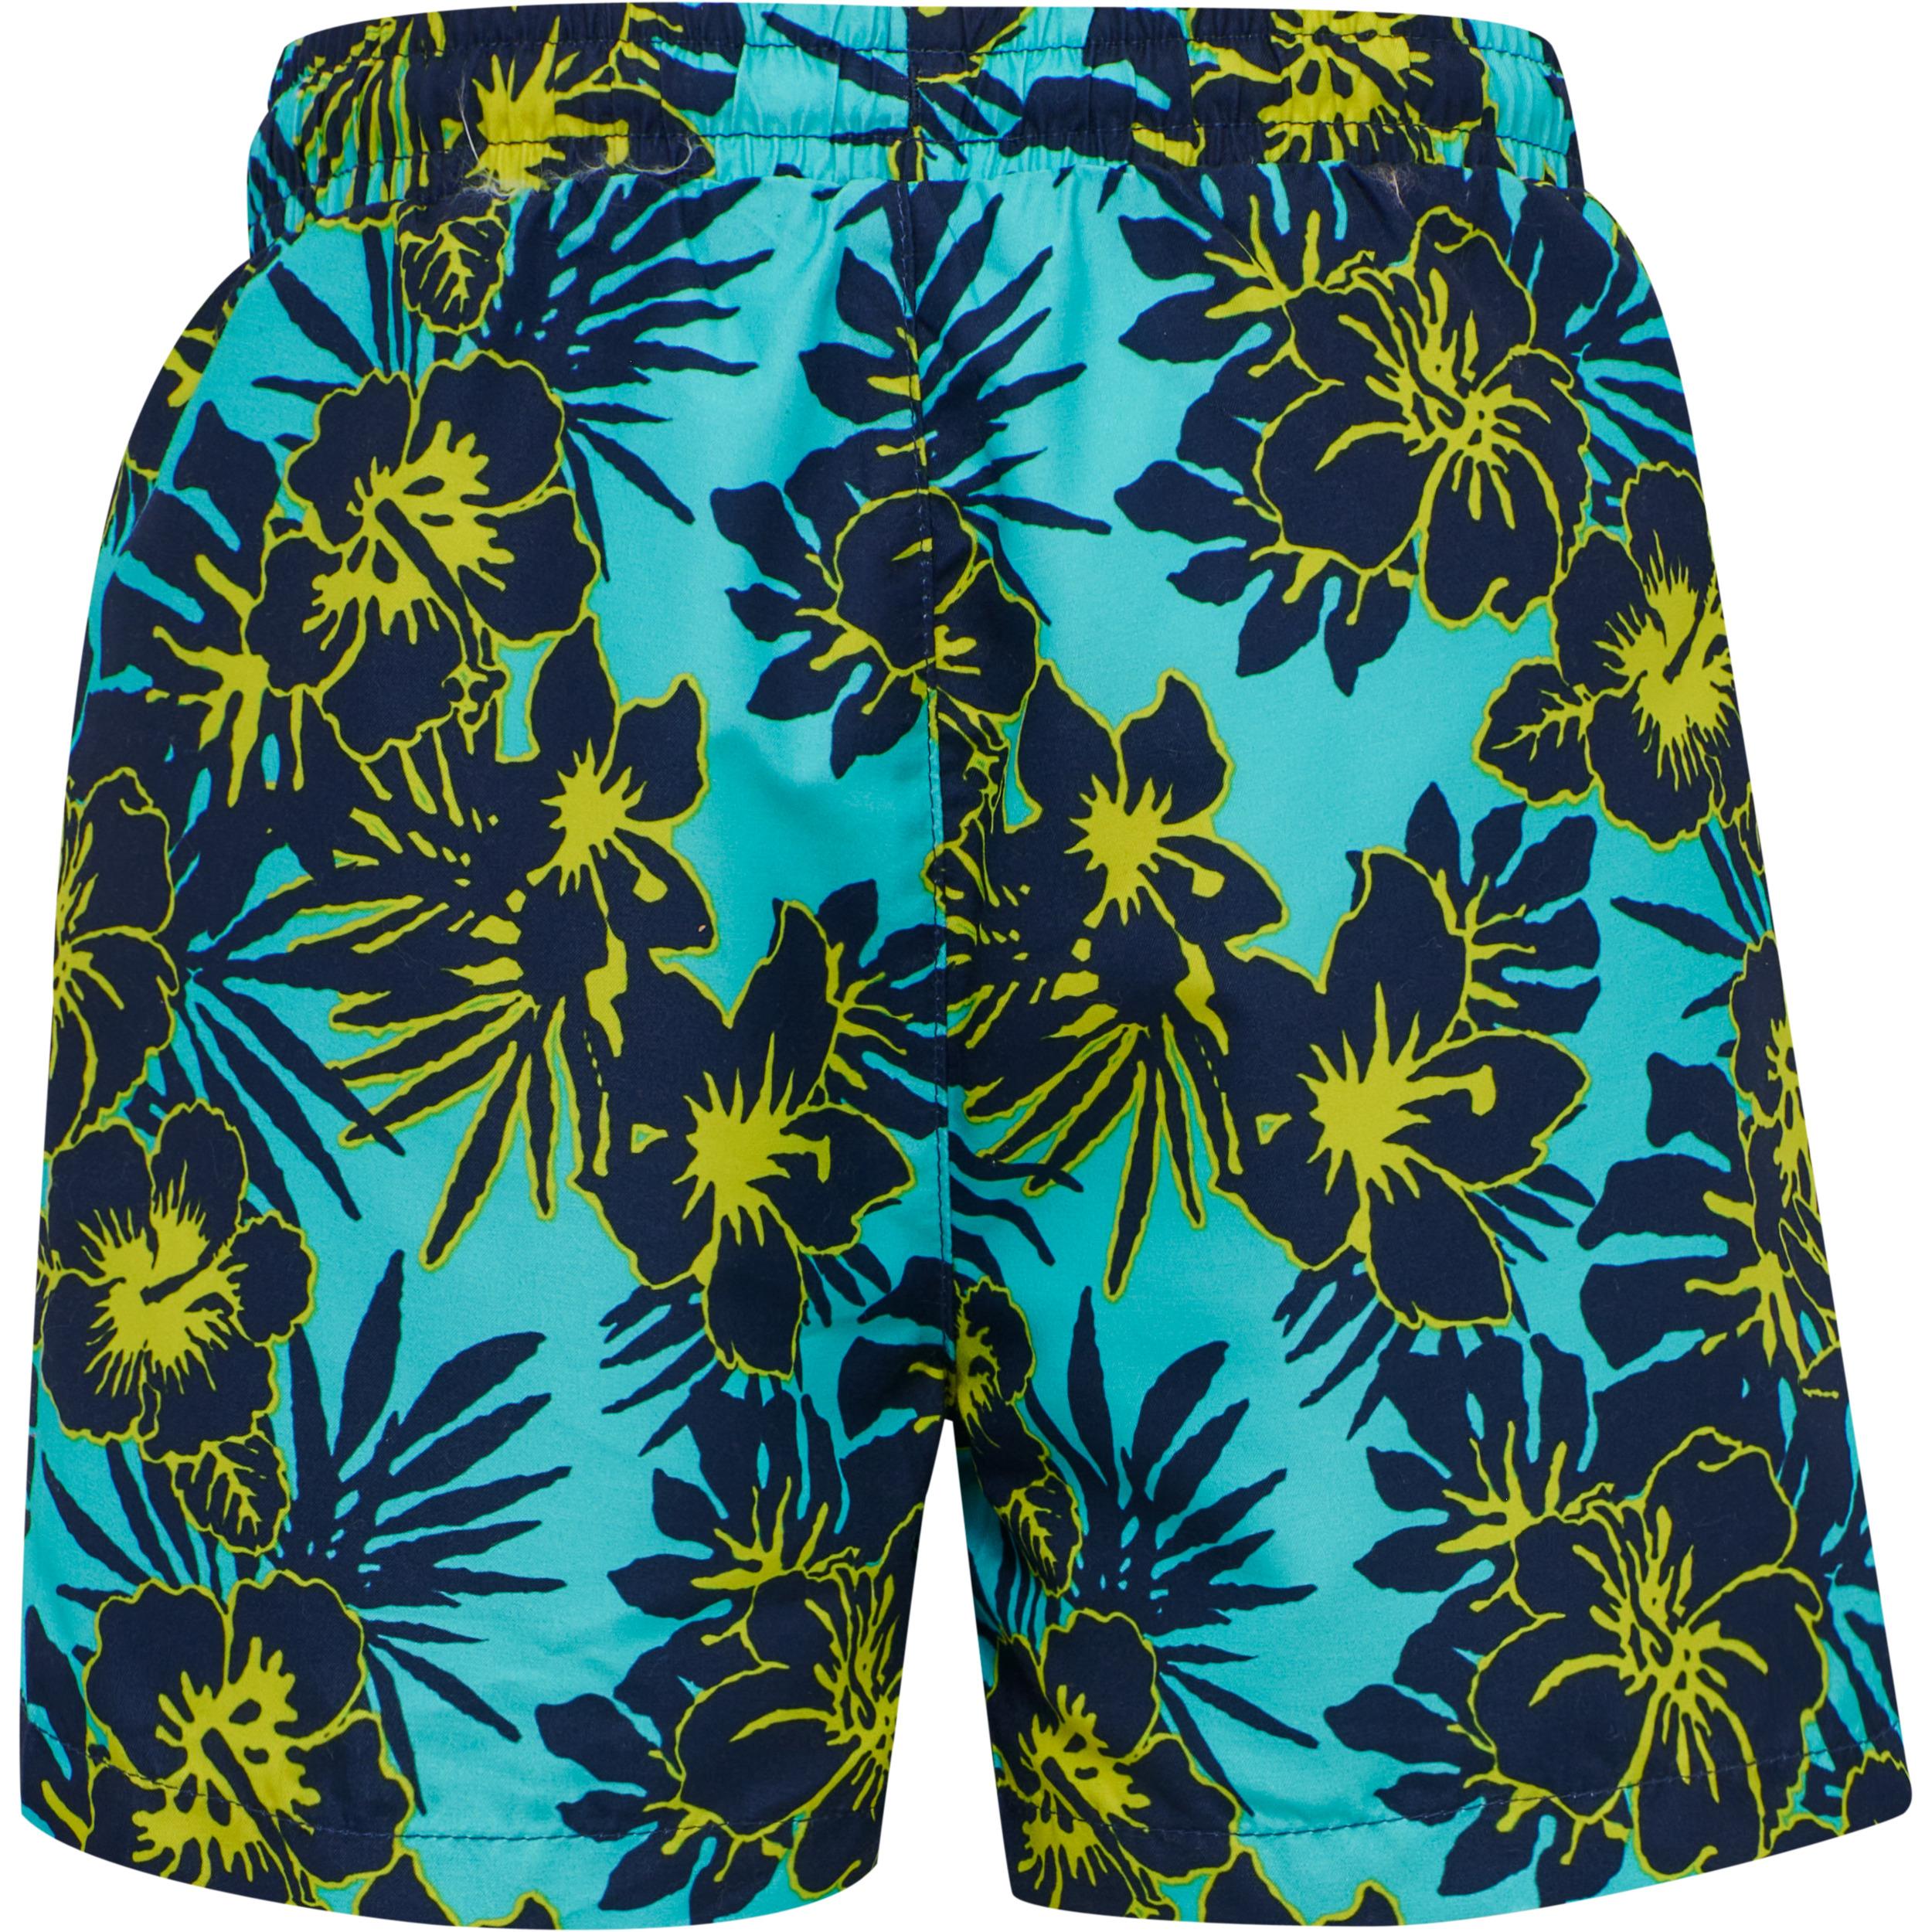 Hummel Chill Board badeshorts, scuba blue, 140